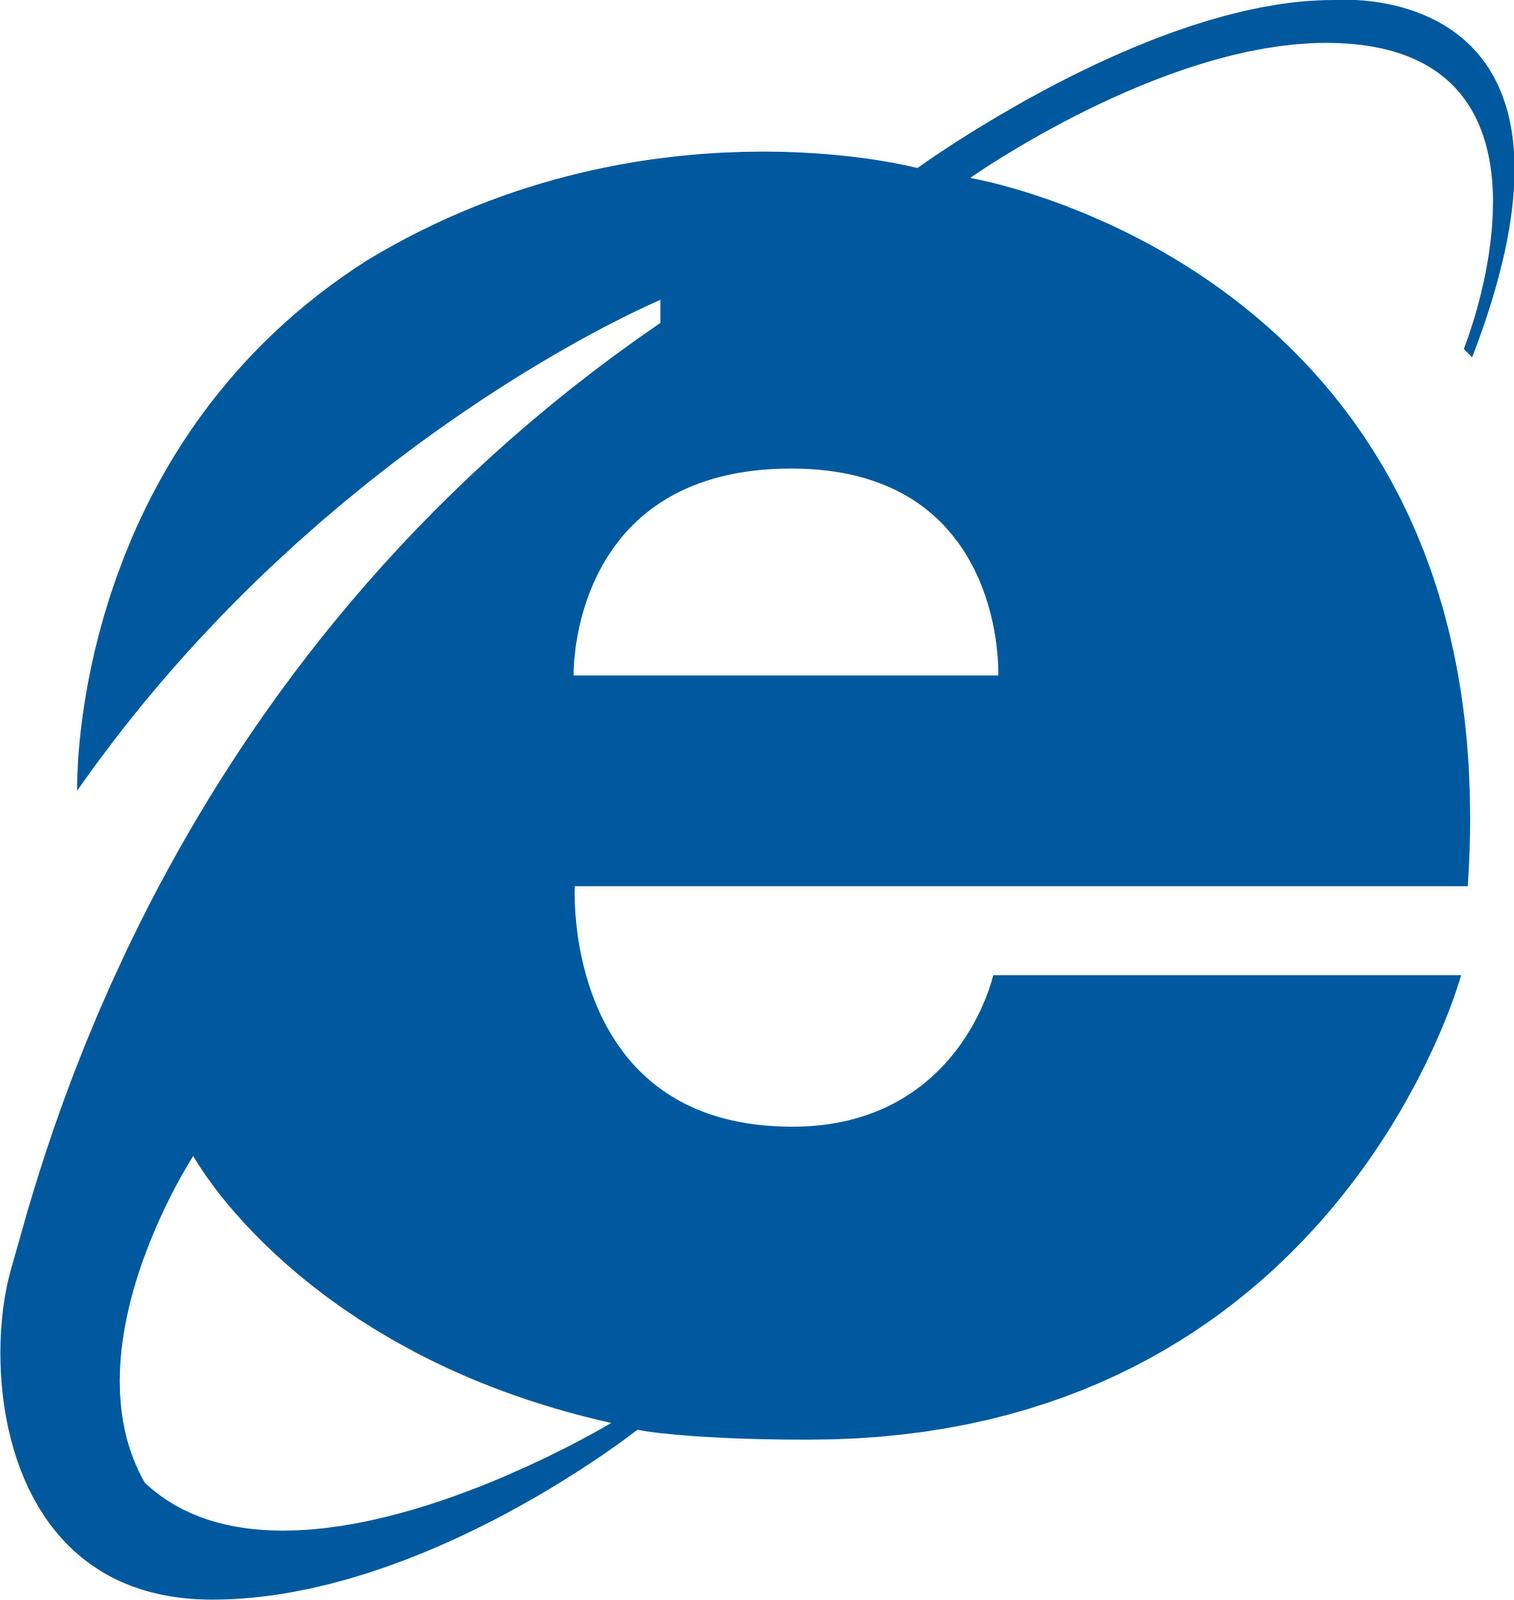 http://www.tecnologiabit.com/wp-content/uploads/2013/01/ie-10-logo.png